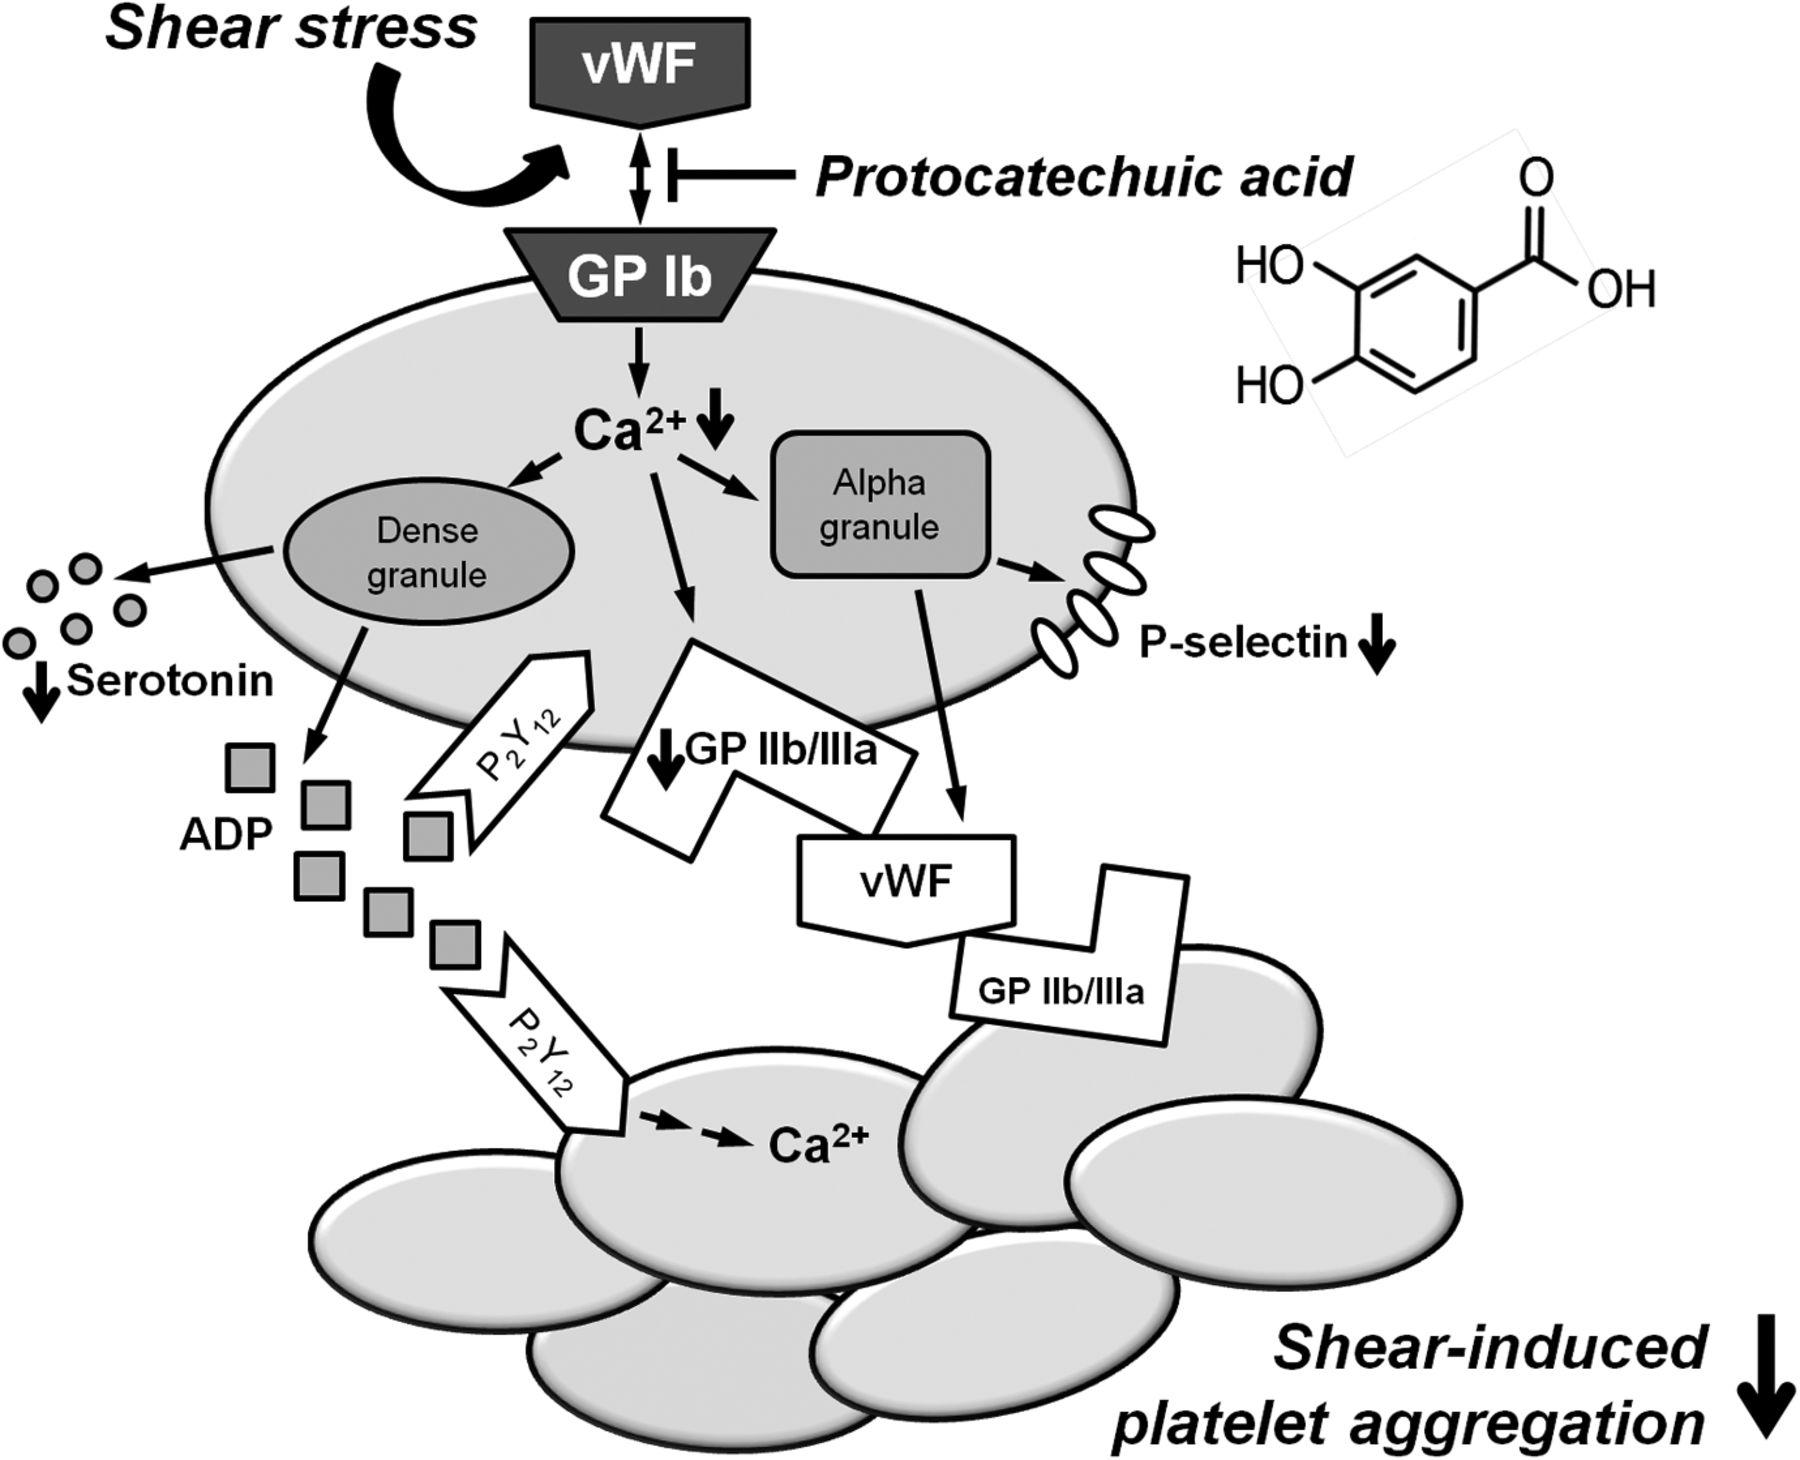 Novel Antiplatelet Activity Of Protocatechuic Acid Through The M Audio Bx5a Circuit Diagram Download Figure